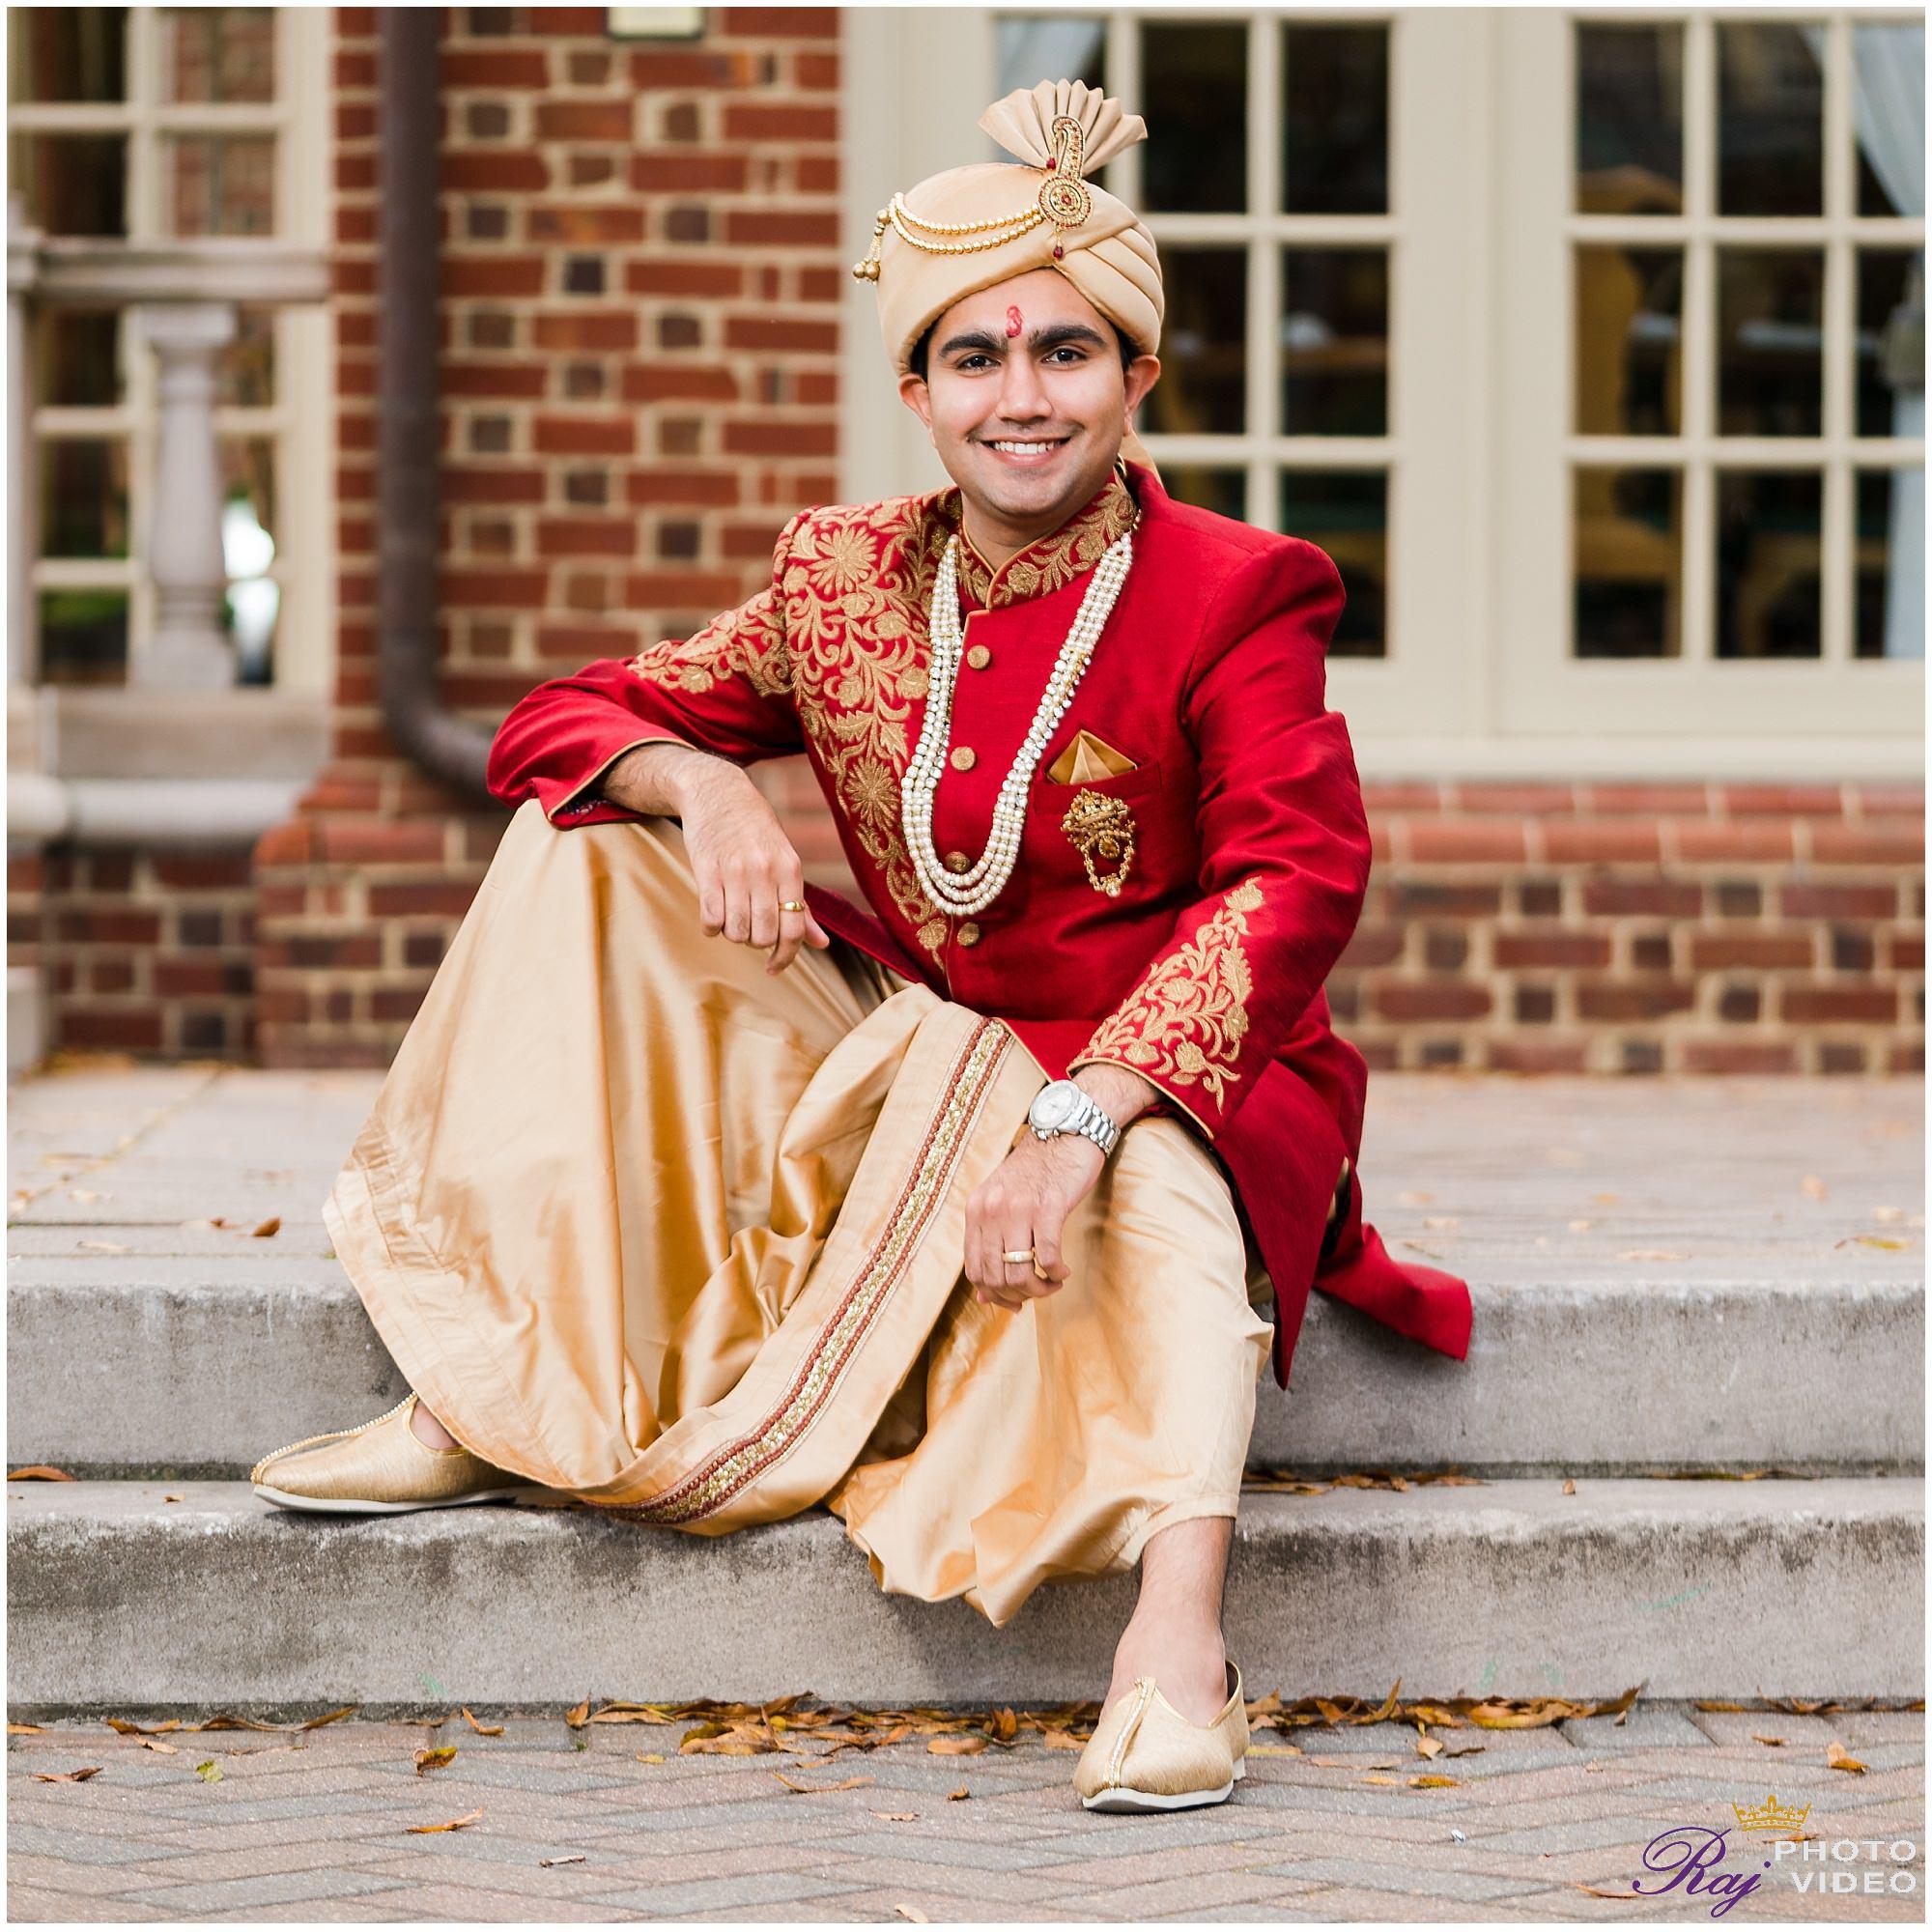 Founders-Inn-and-Spa-Virginia-Beach-VA-Indian-Wedding-Harini-Vivek-60.jpg